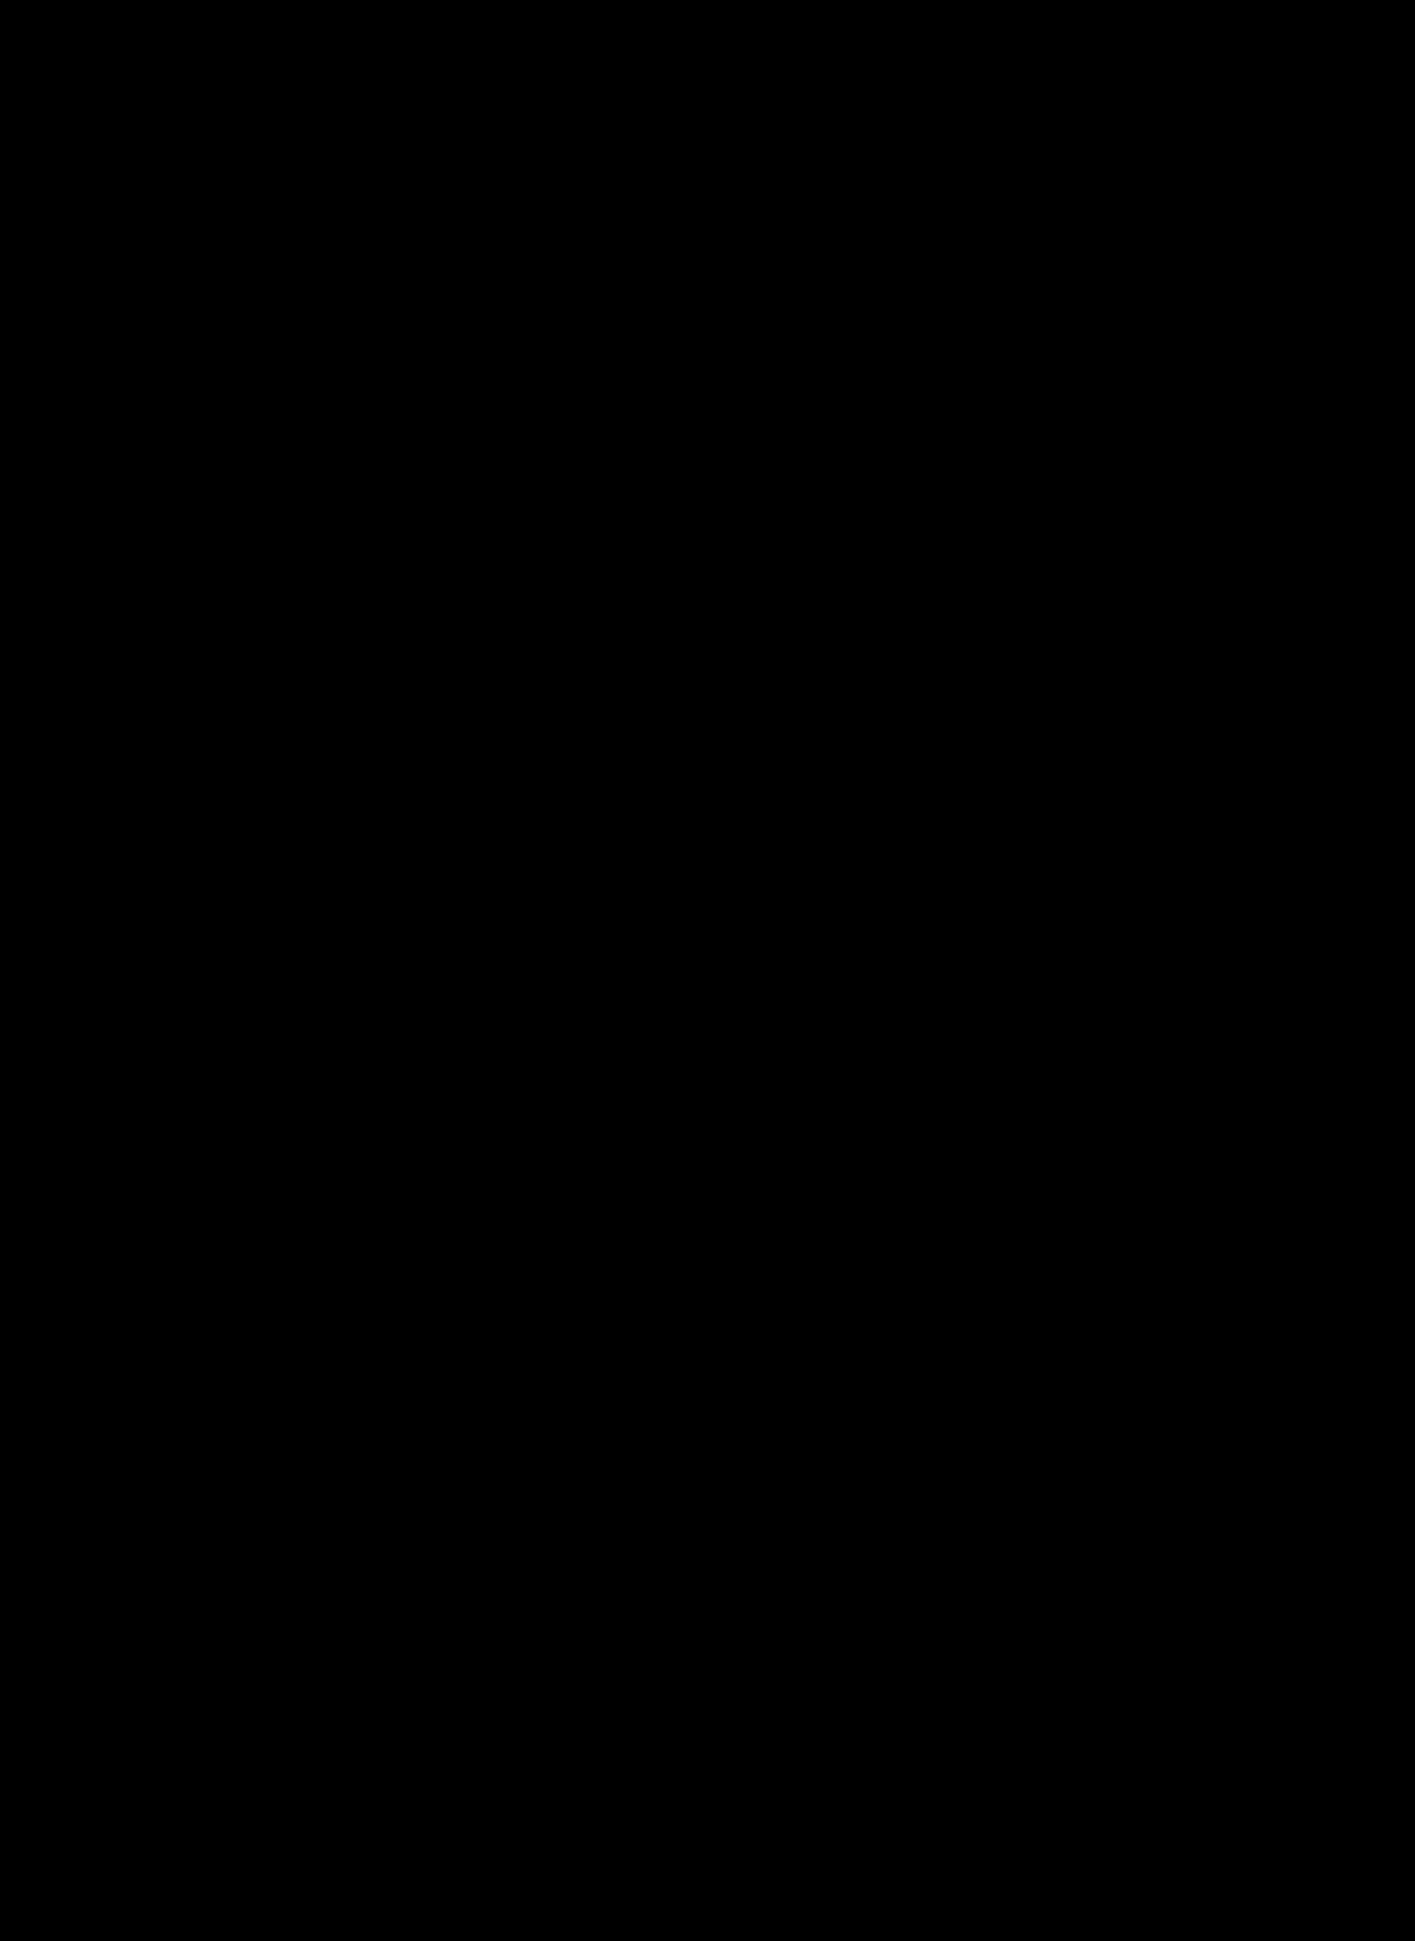 BECENTRAL-logo-green-rvb-big 2 copie.png